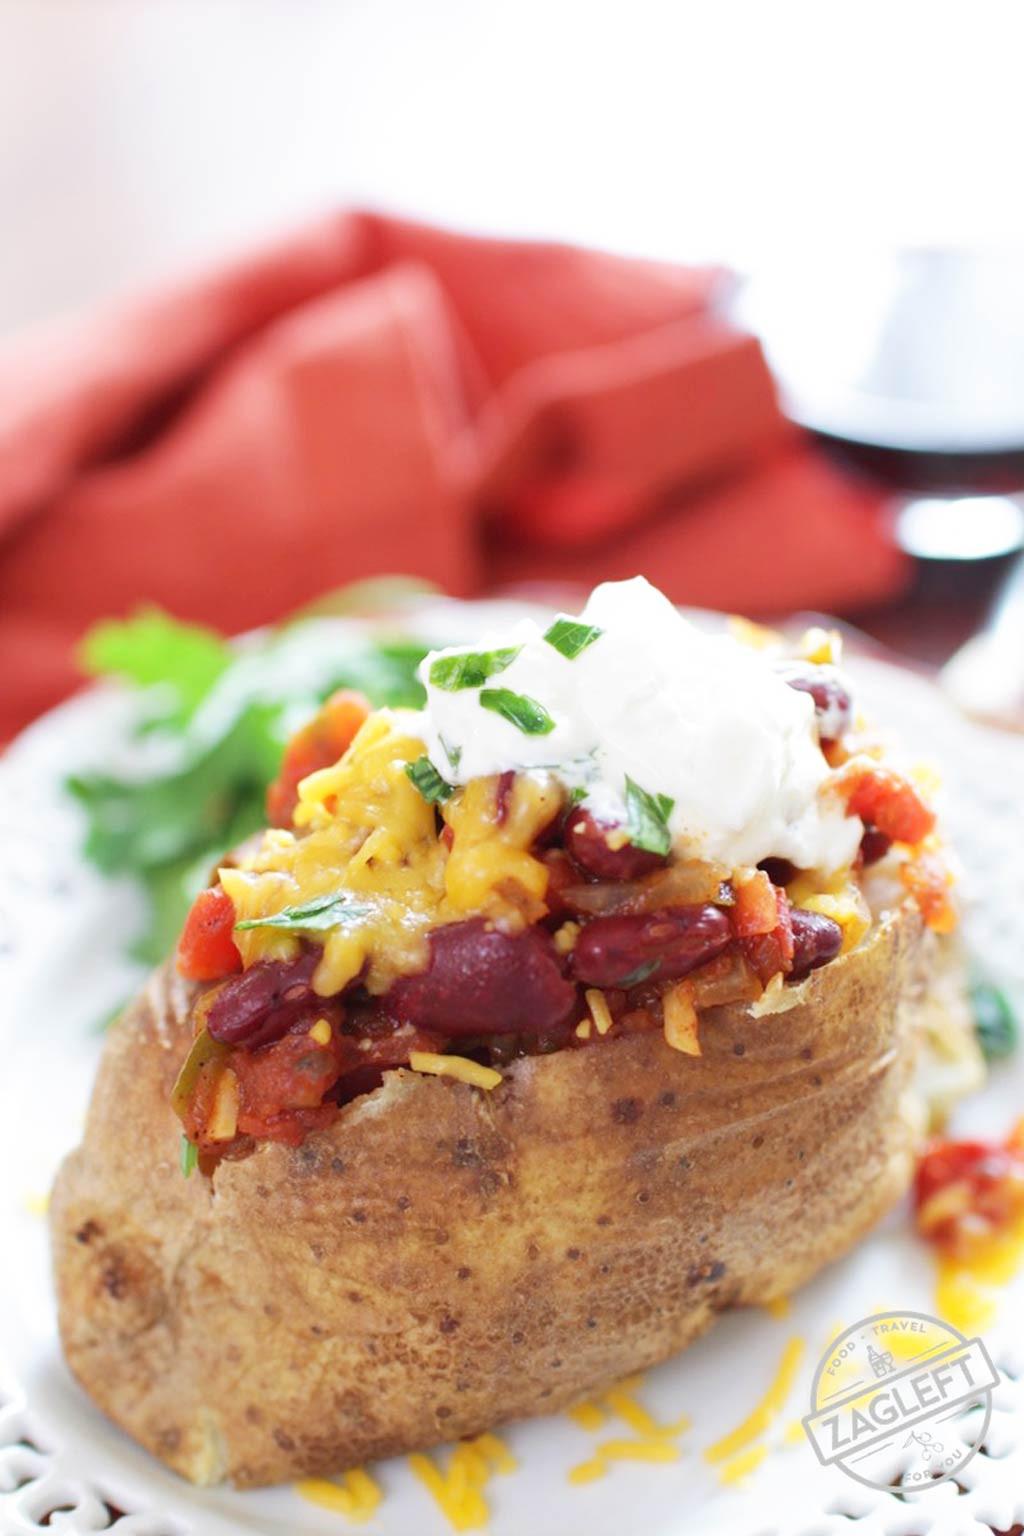 Baked Potato With Cheese  Chili Cheese Baked Potato ZagLeft